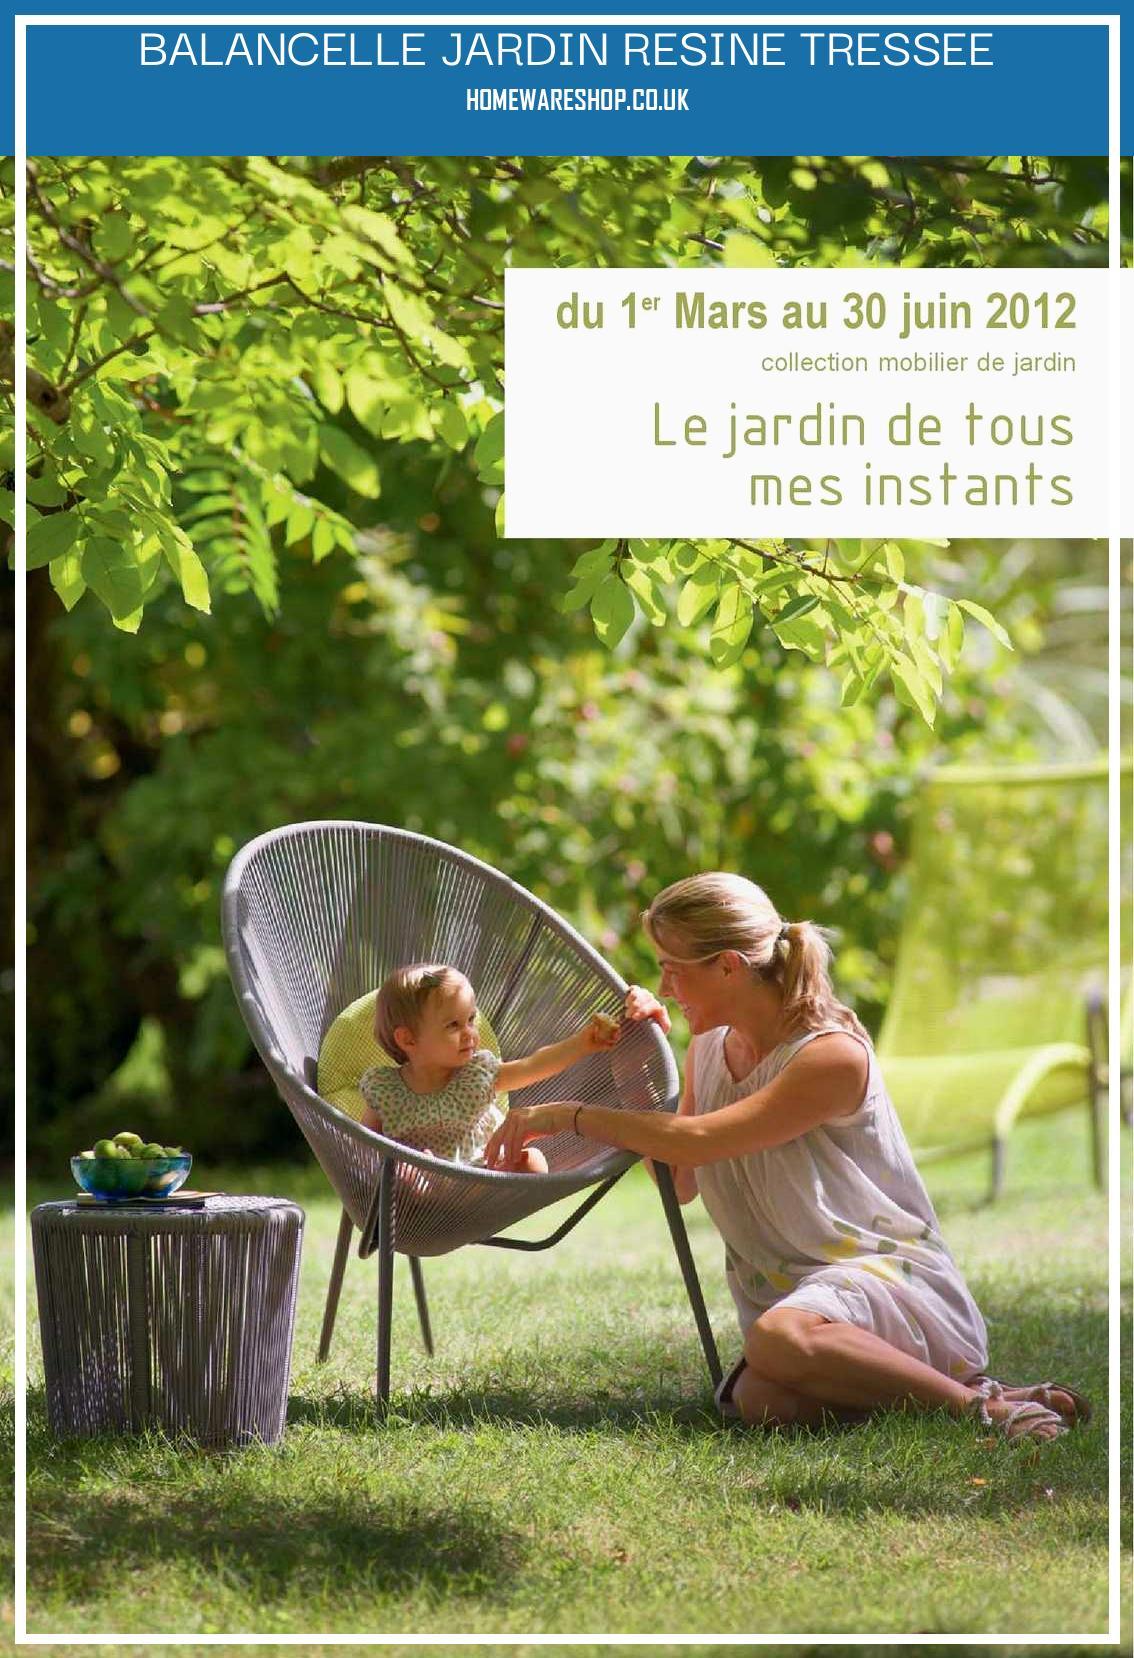 Balancelle Jardin Leclerc – Homewareshop dedans Balancelle De Jardin Leclerc